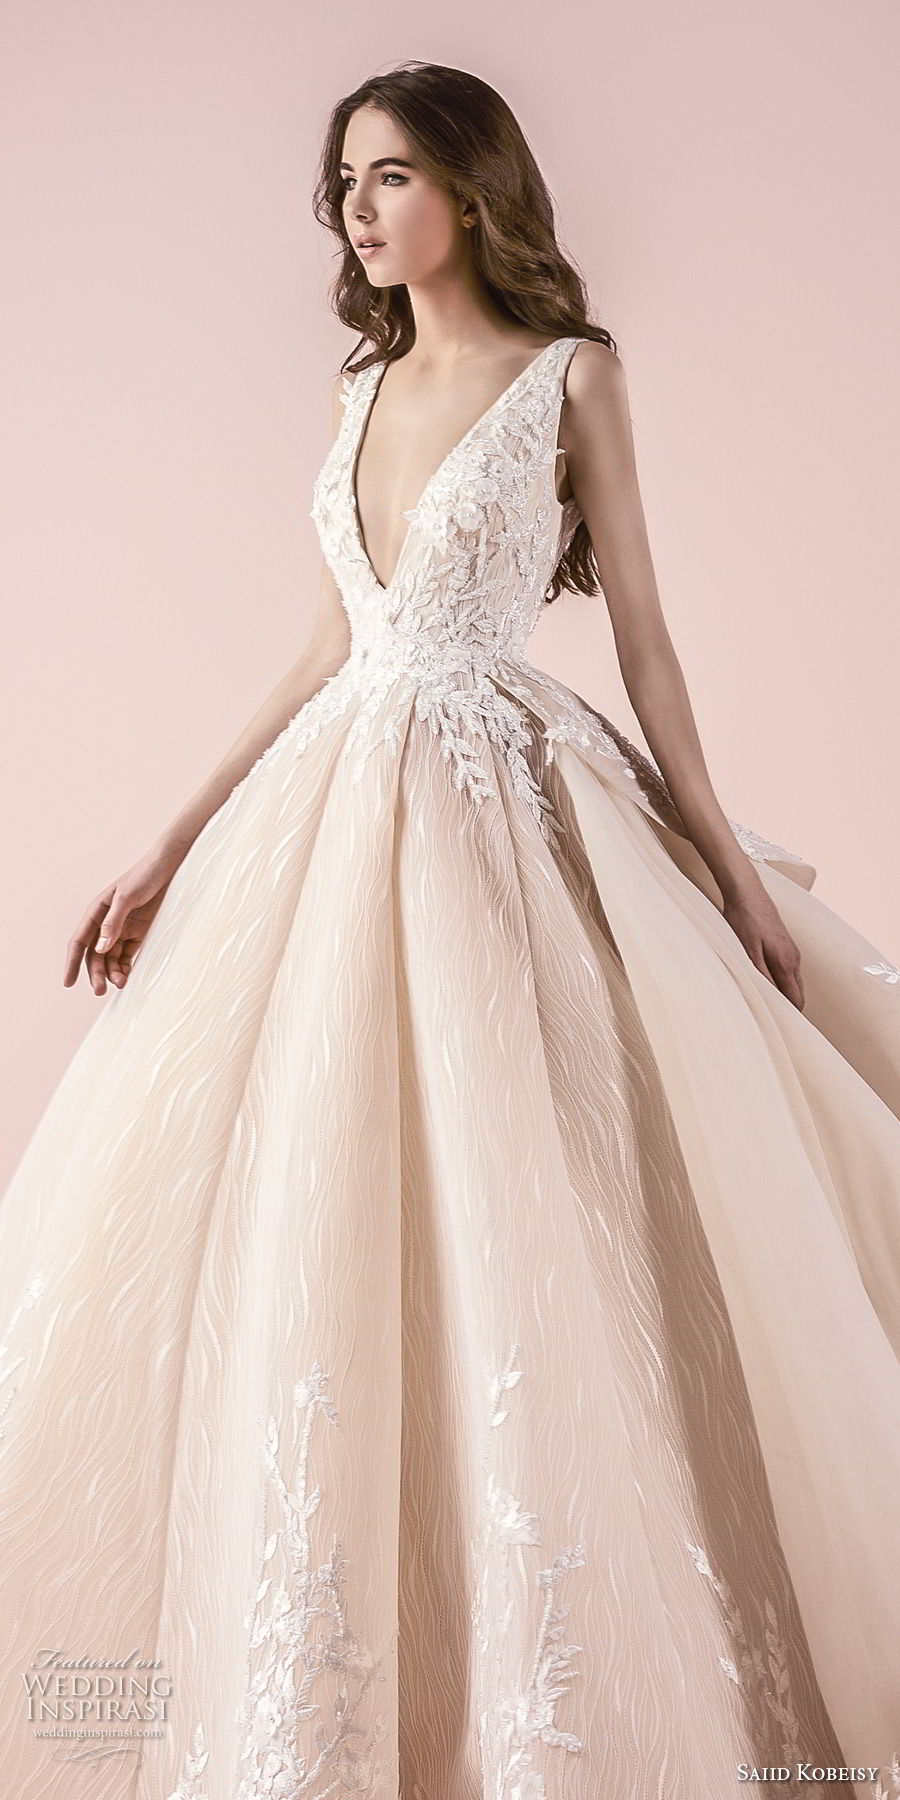 saiid kobeisy 2018 bridal sleeveless deep v neck heavily embellished bodice romanitc princess blush color ball gown wedding dress (3258) zv